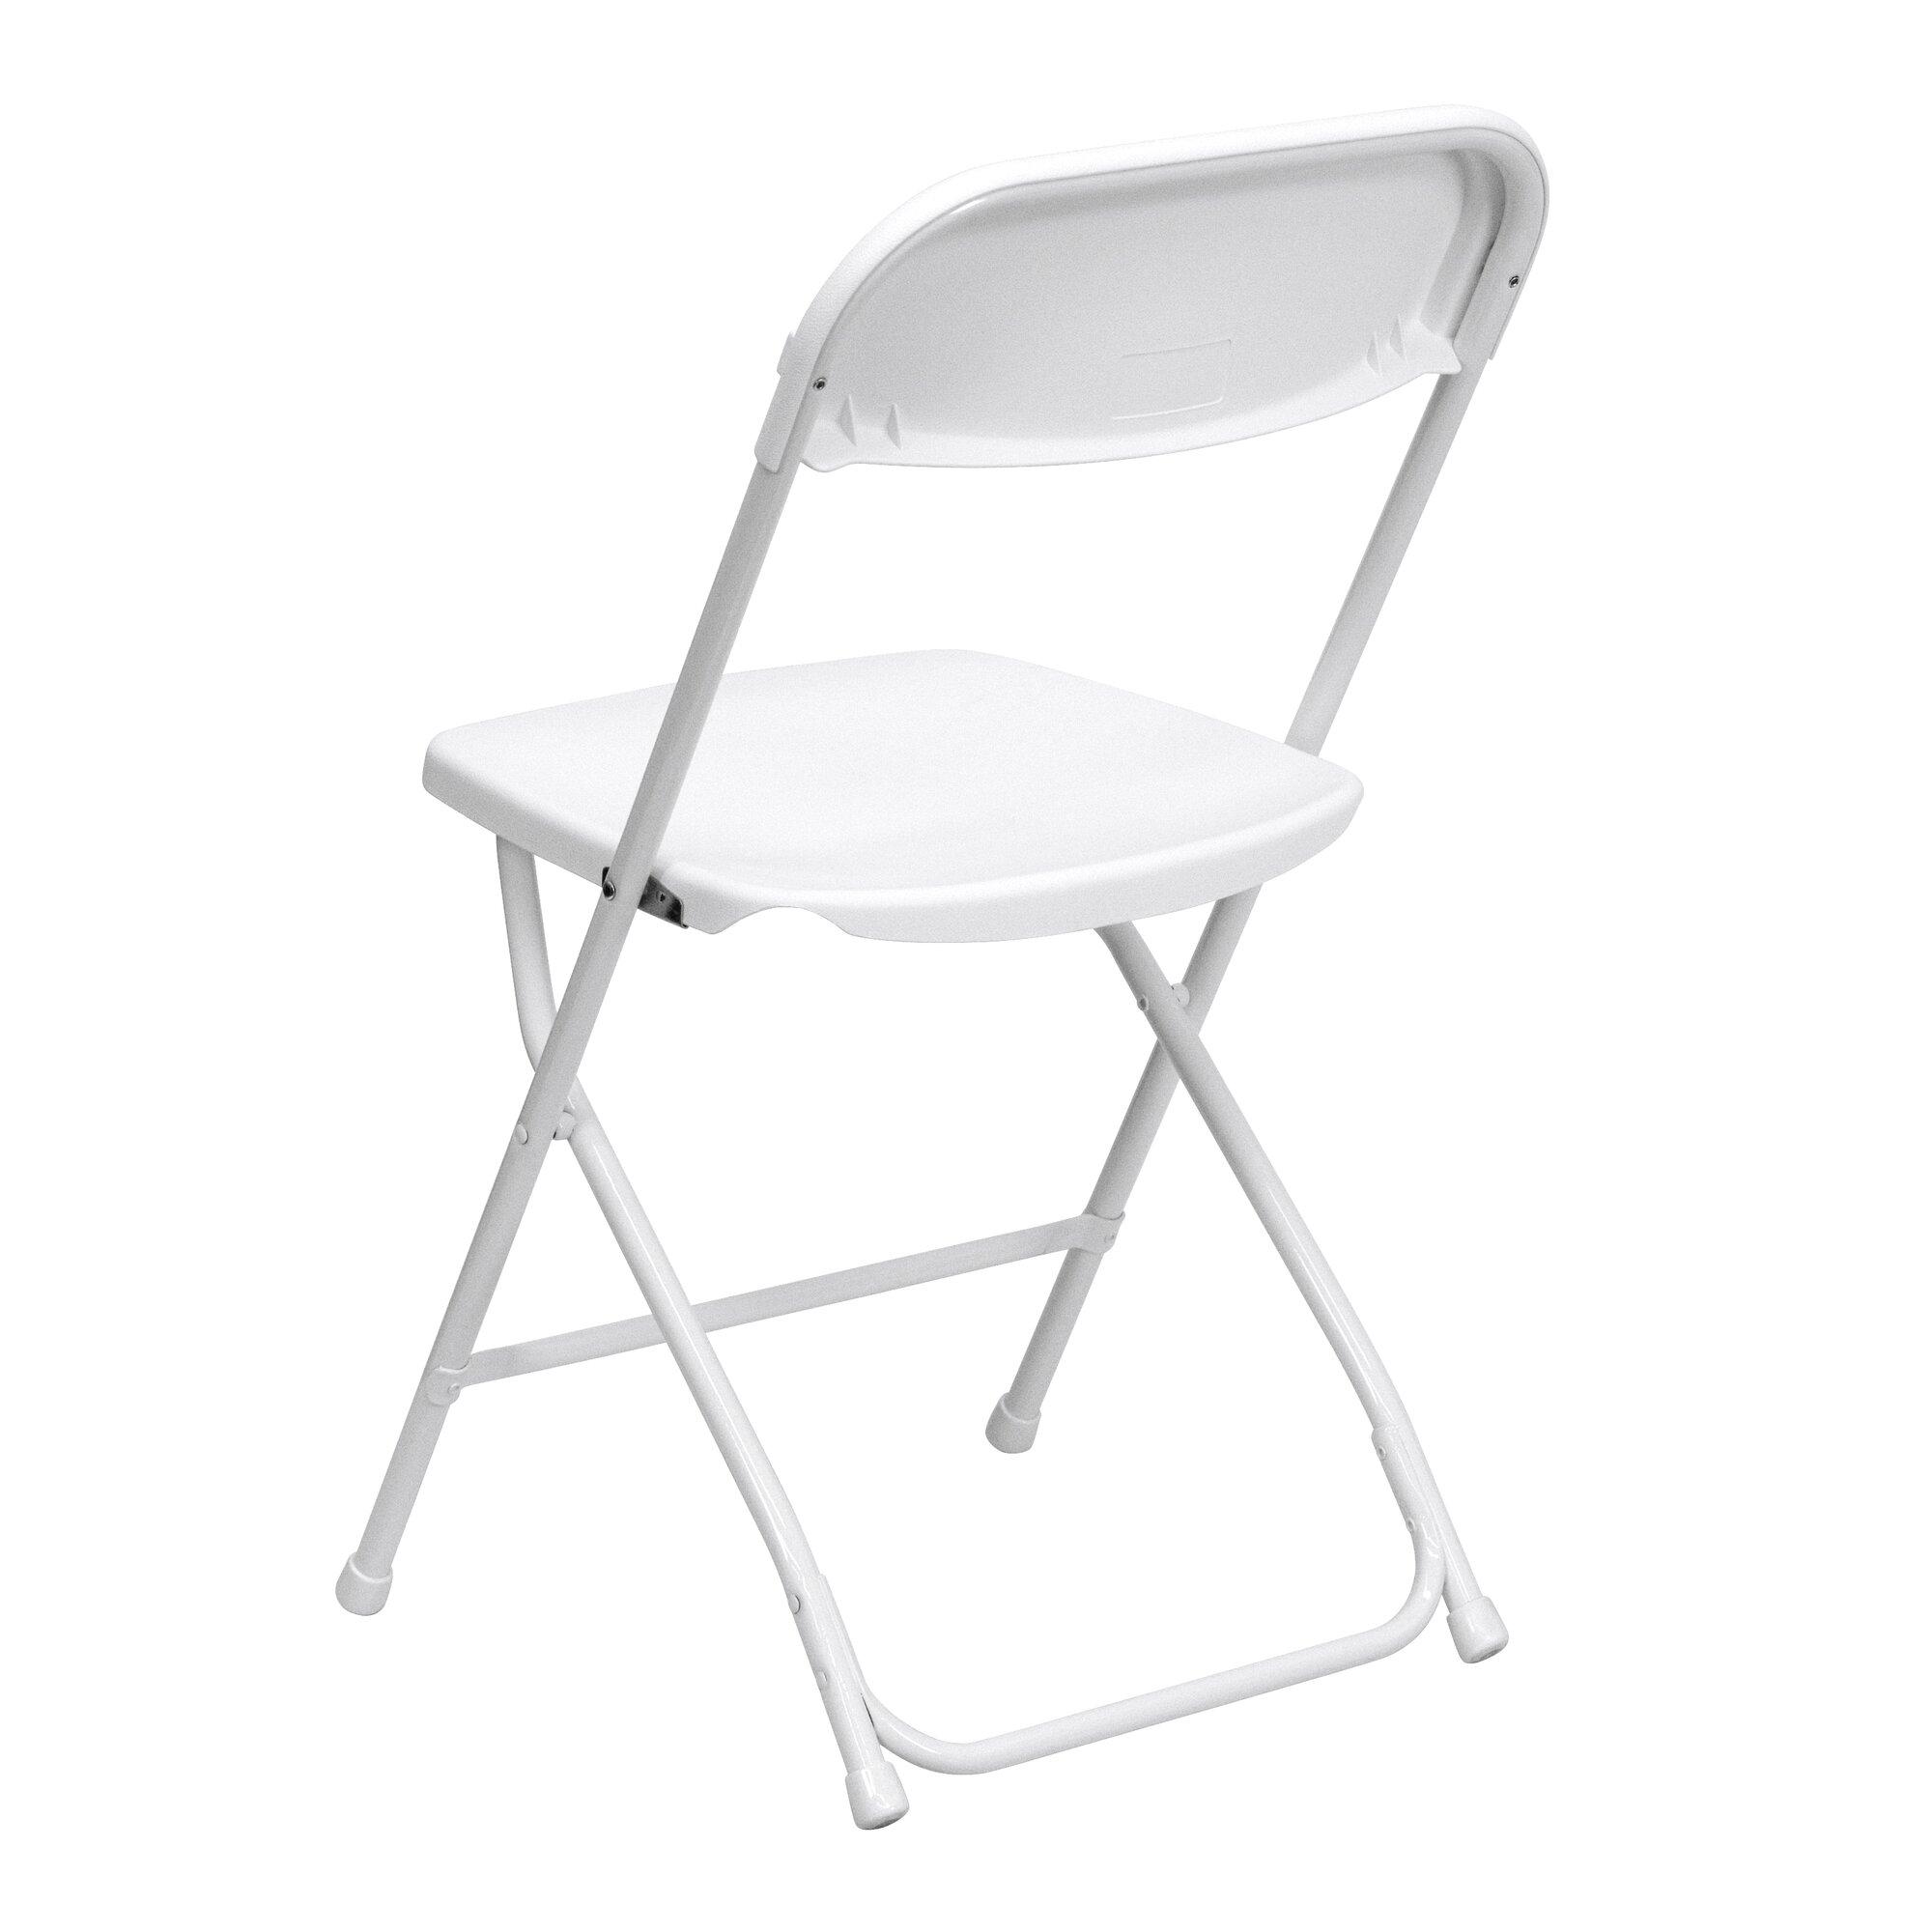 Hercules Series Chairs Instachair